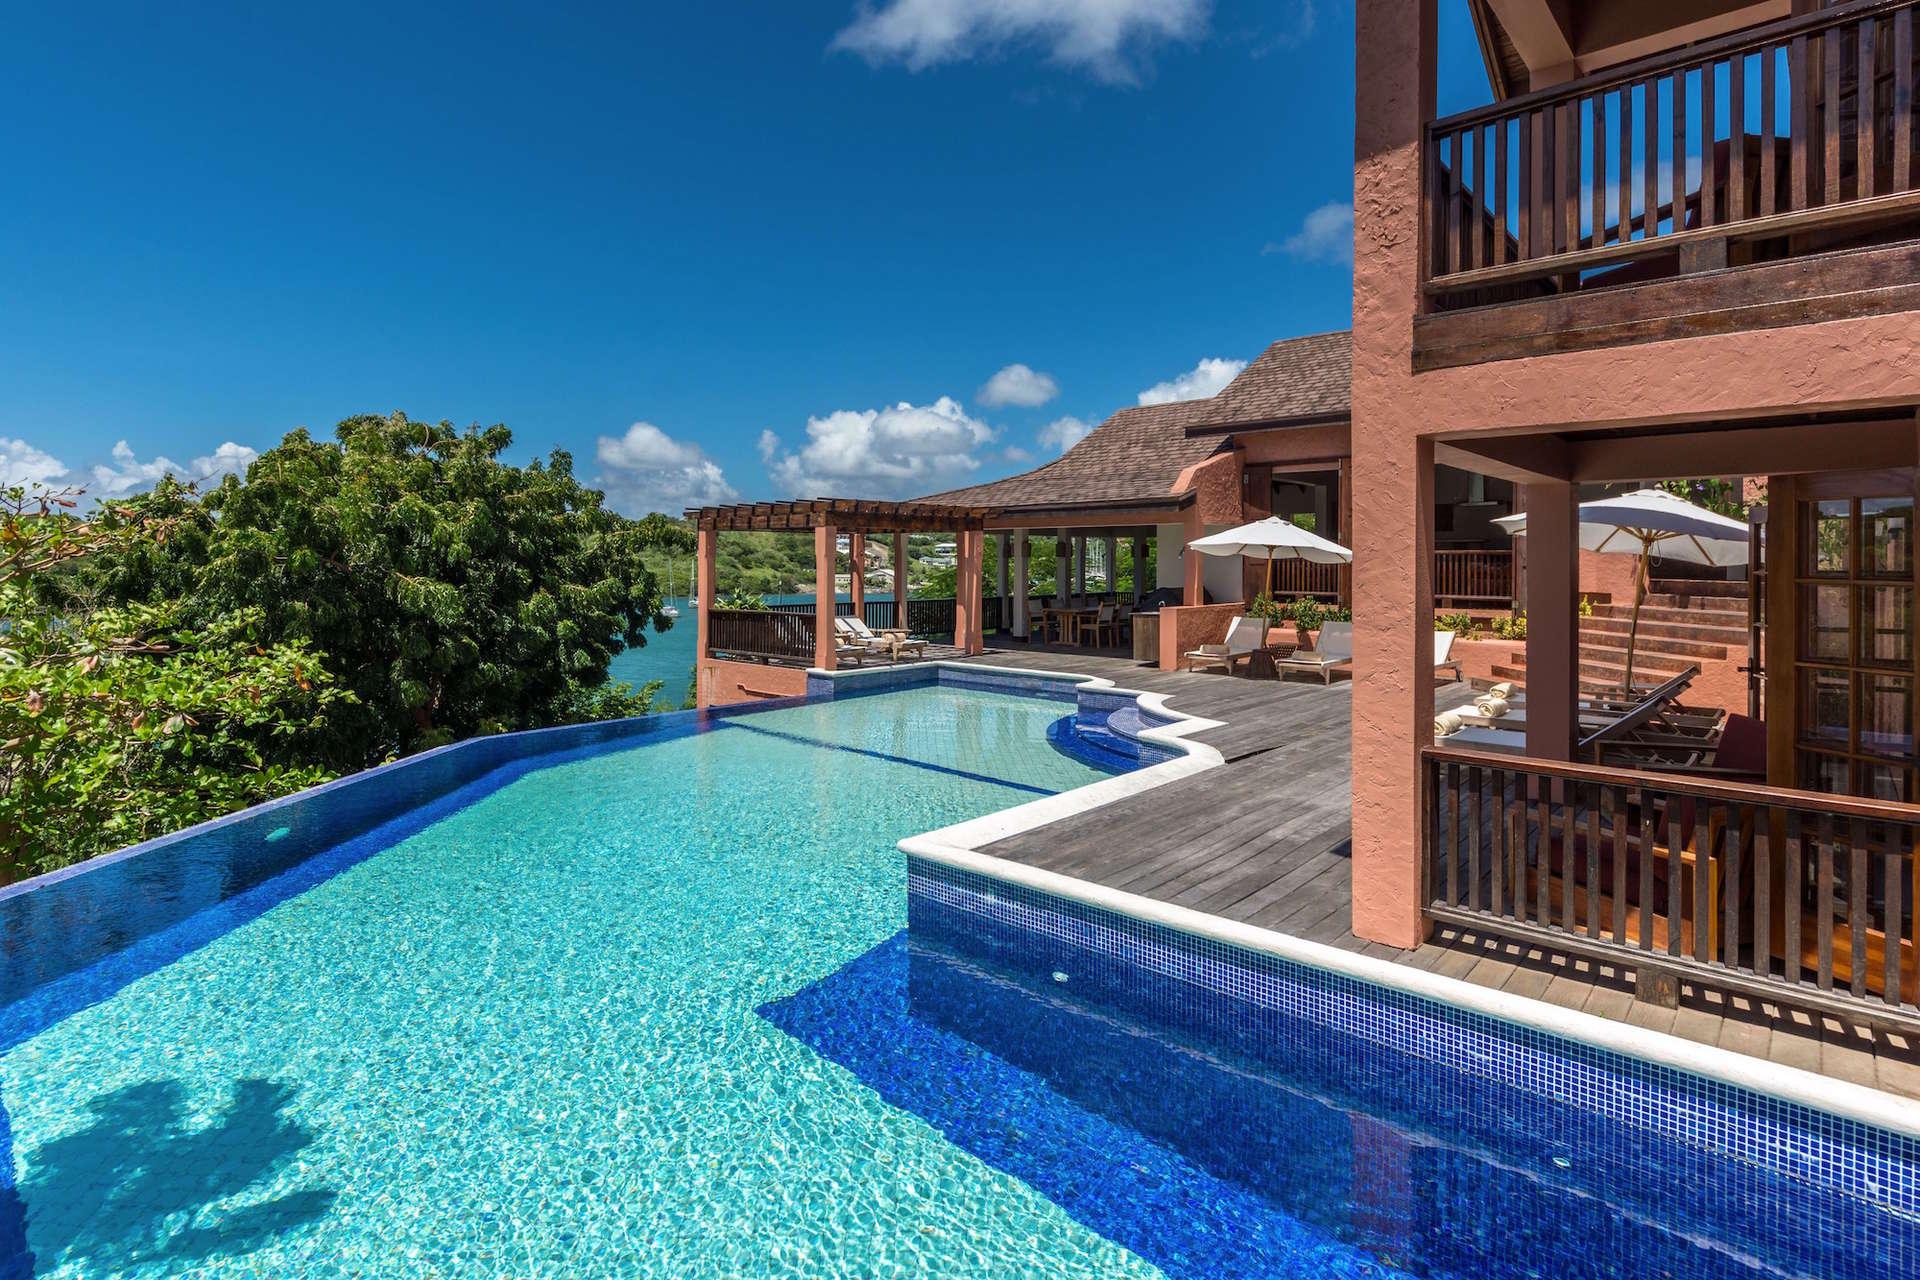 Luxury villa rentals caribbean - Grenada - Lanse aux epines - Calabash hotel - Pool House - Image 1/5